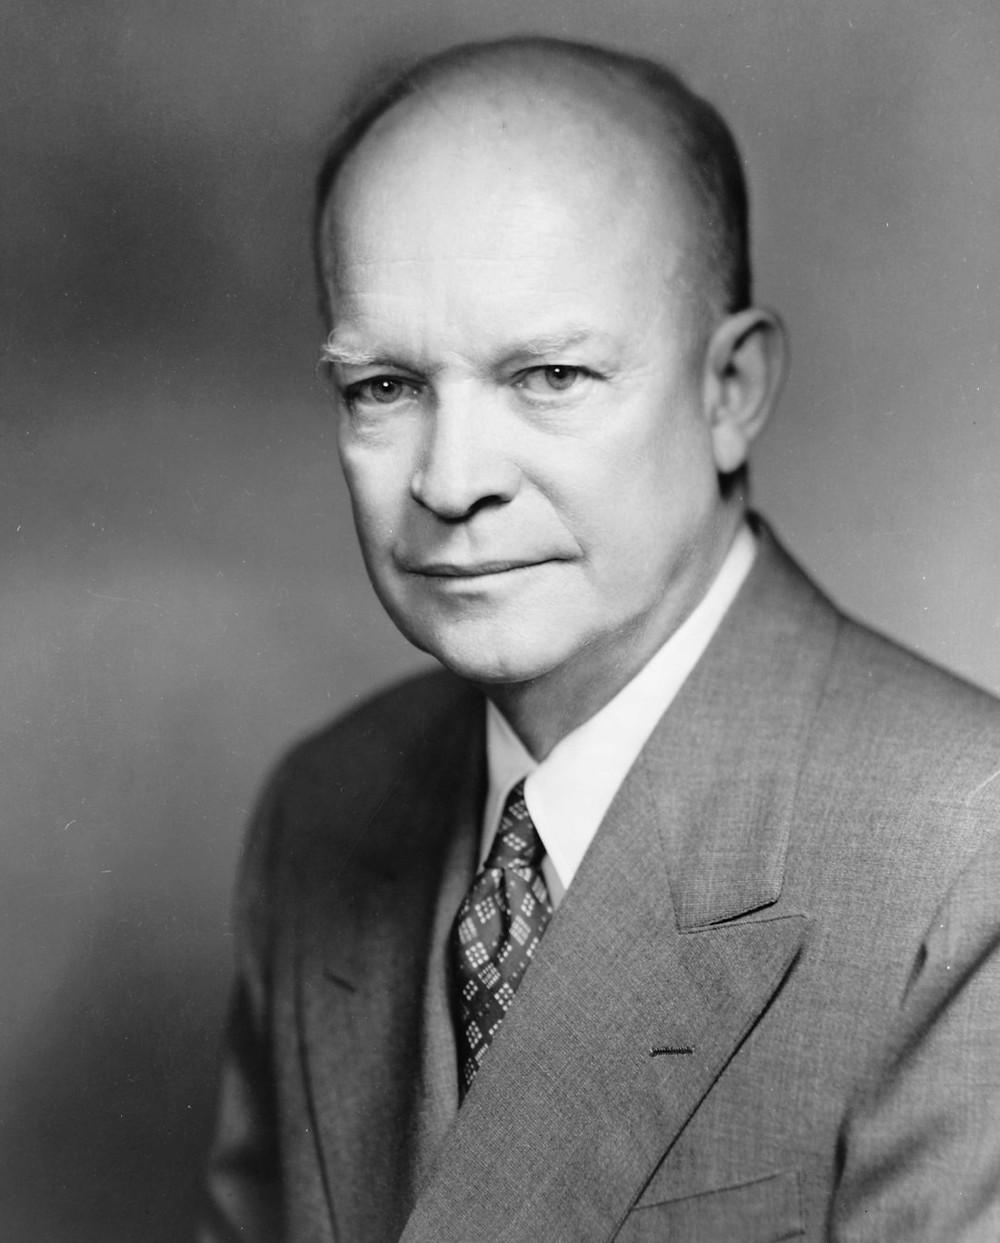 L'ex presidente USA Dwight_Eisenhower nel 1952